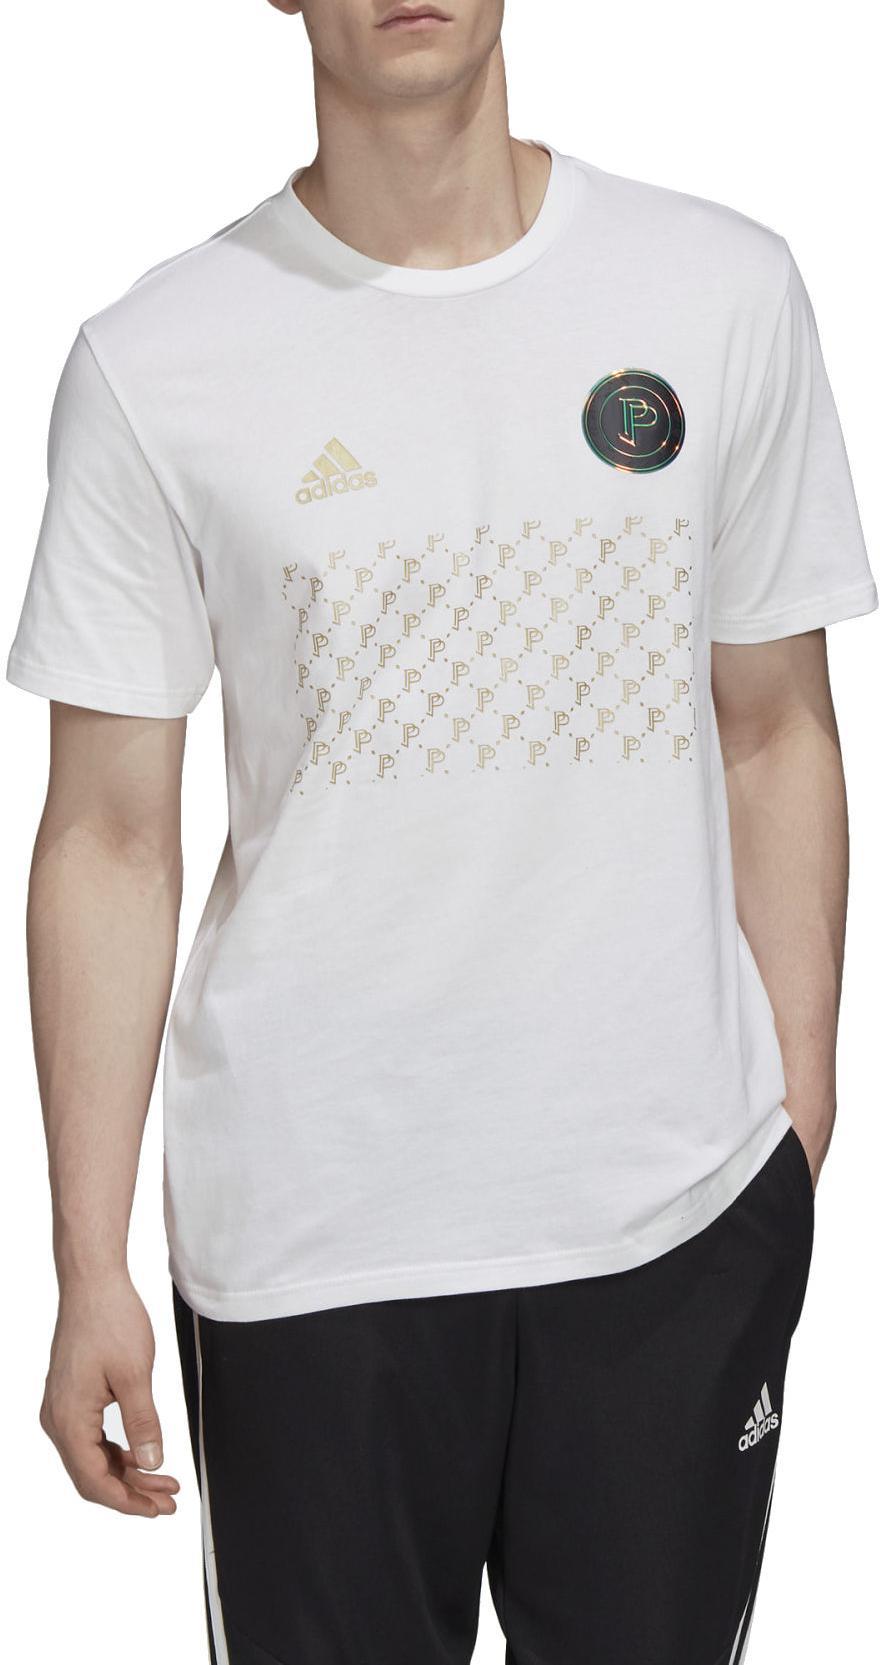 Tričko adidas Paul Pogba Graphic T shirt